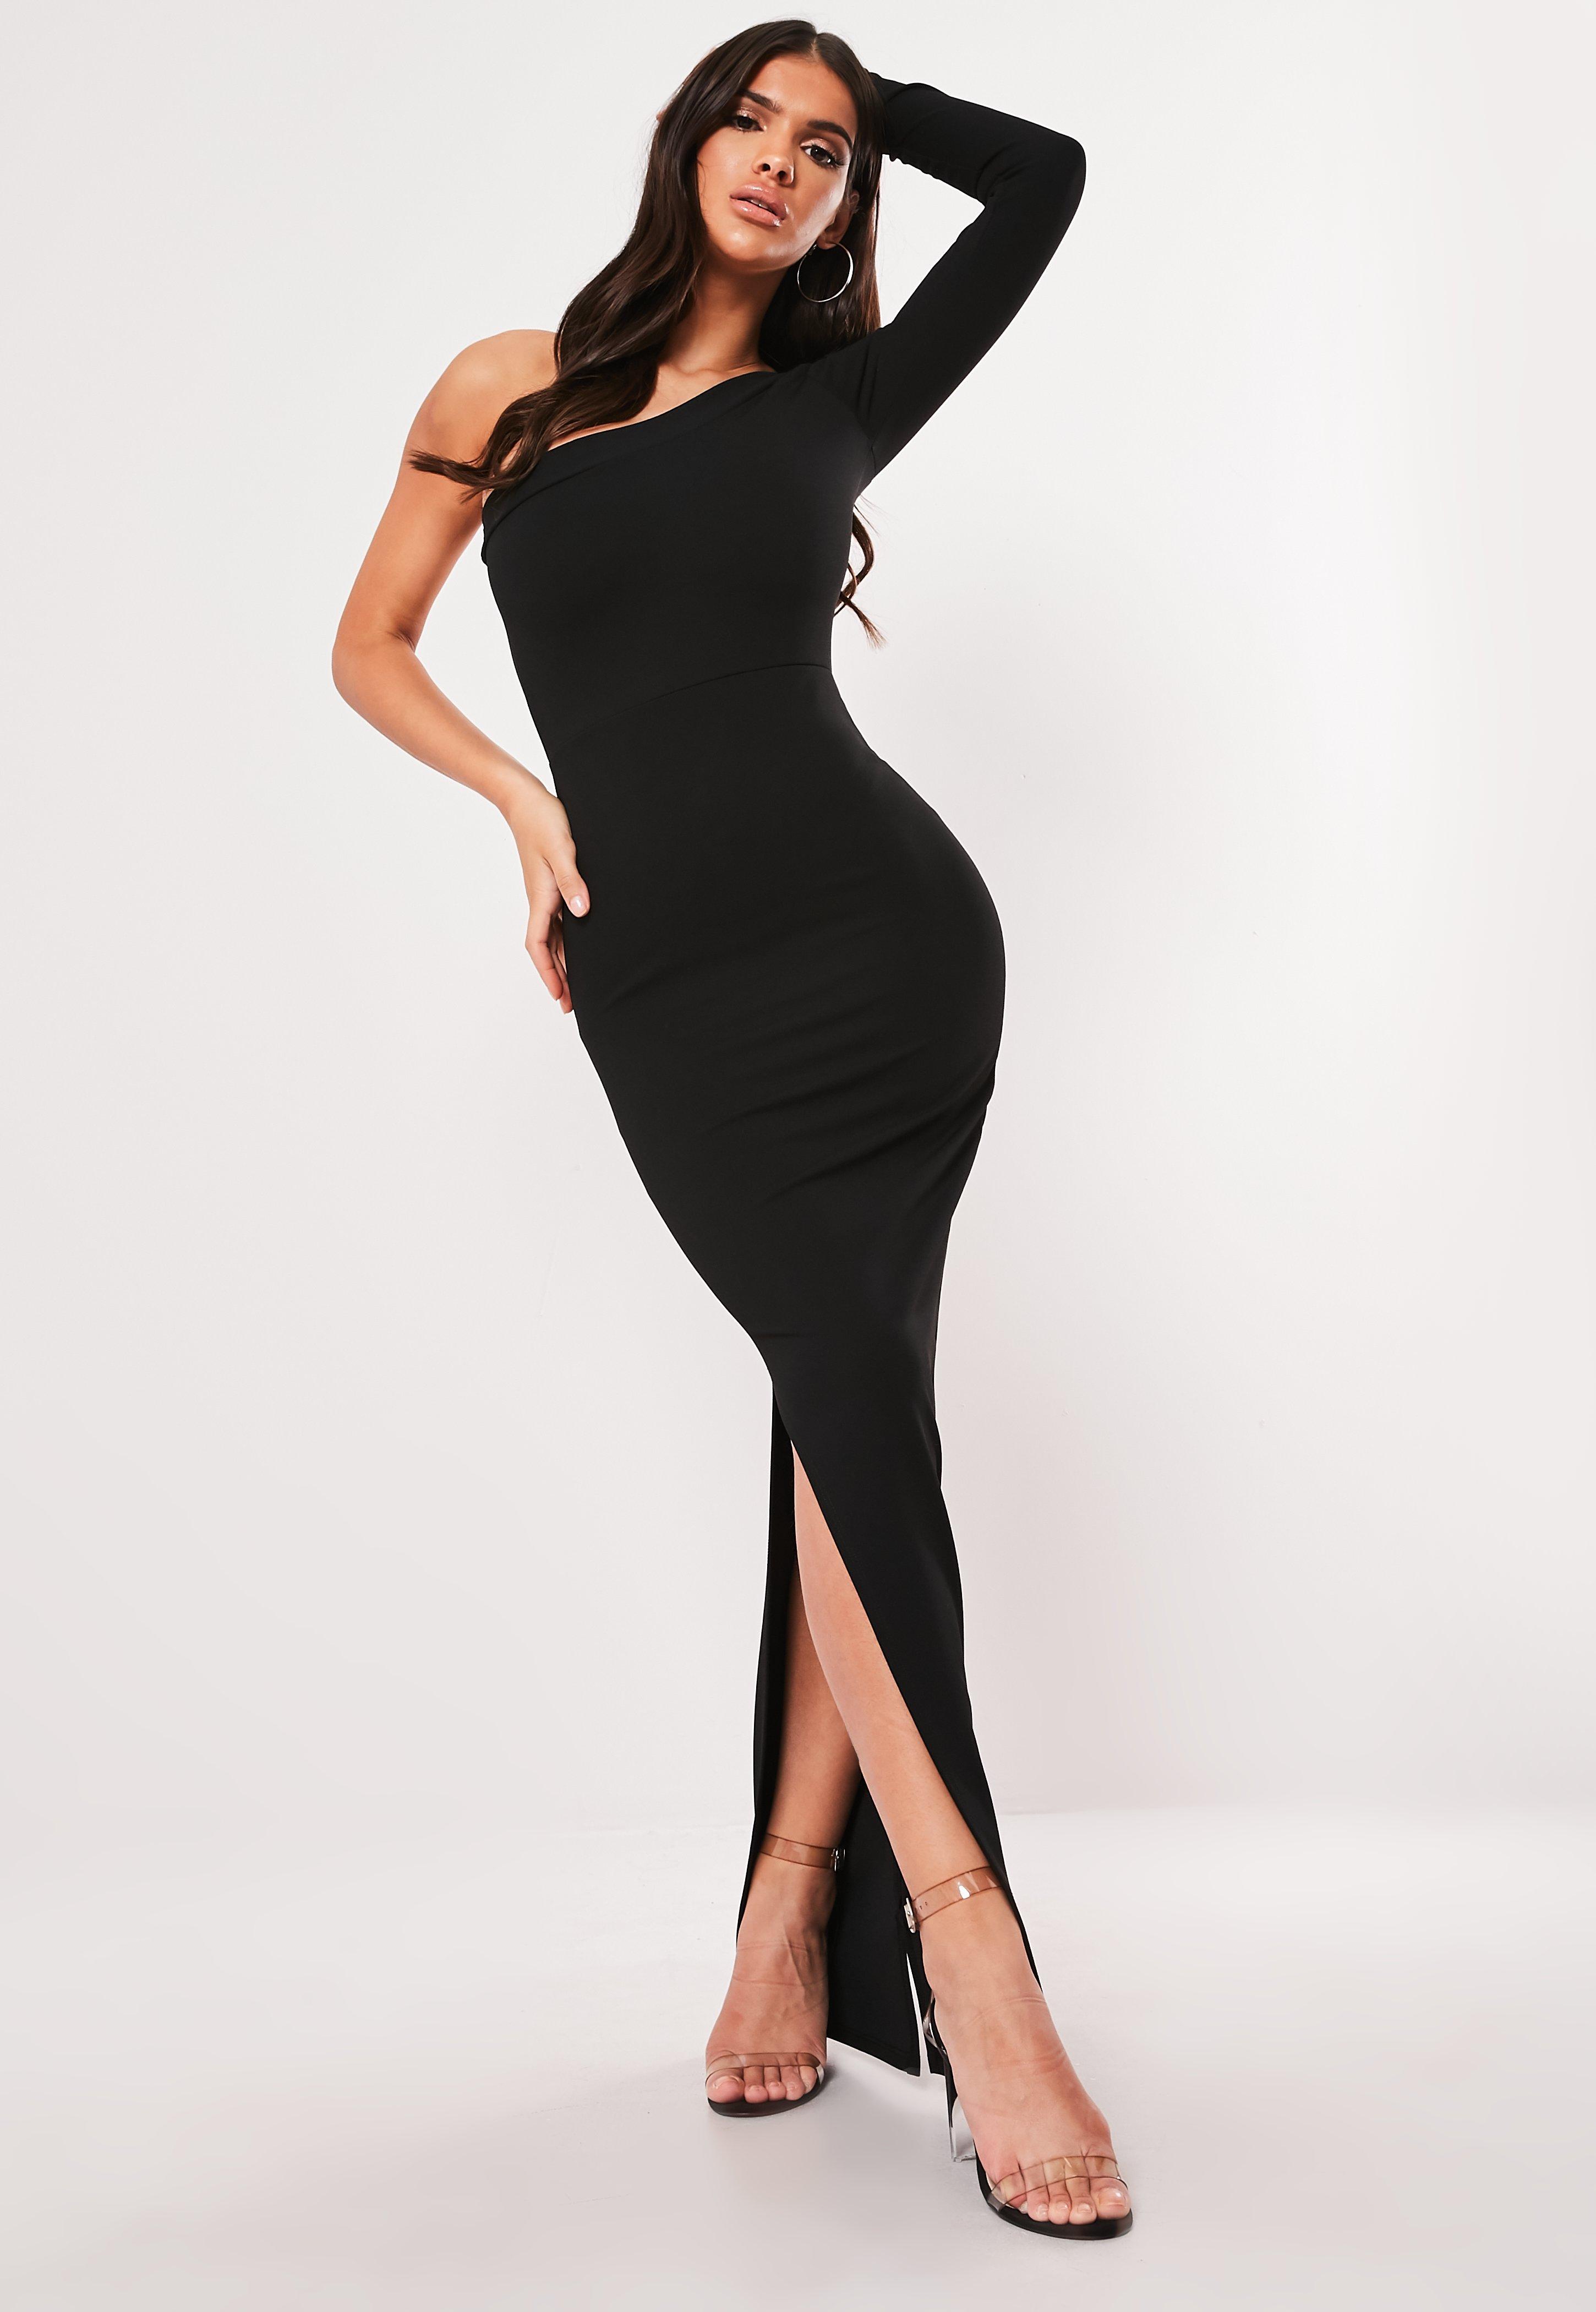 bf611f3c Little Black Dresses   LBDs & Black Dresses - Missguided Australia